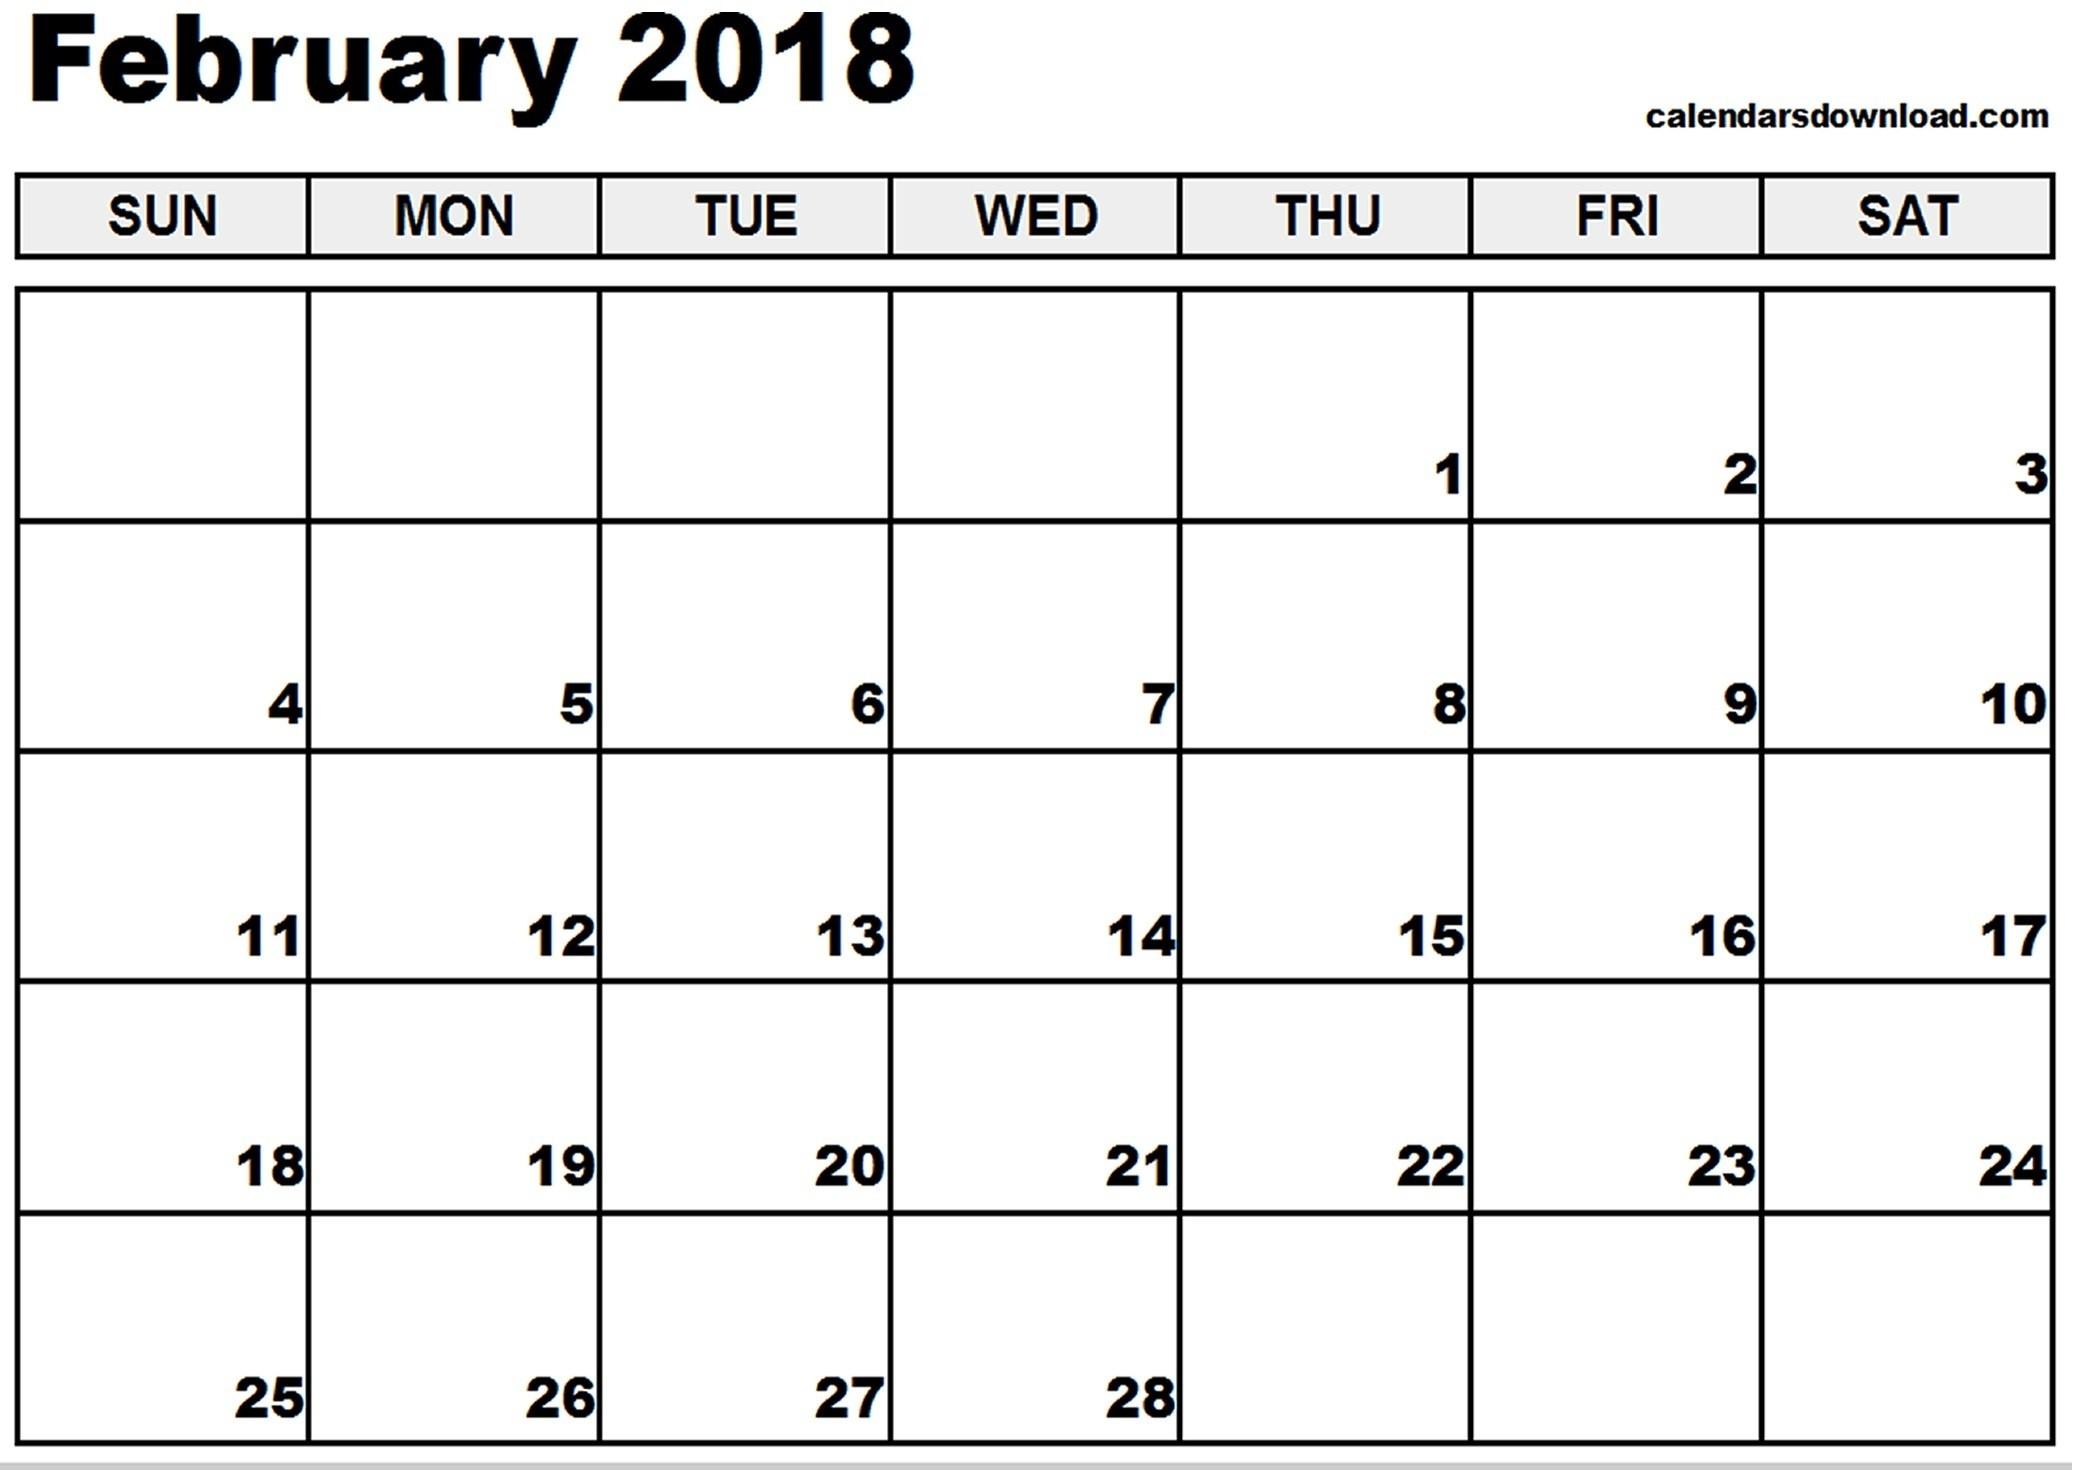 Calendar February 2018 January 2018 Yeniscale Jan 2018 Calendar Printable e Page